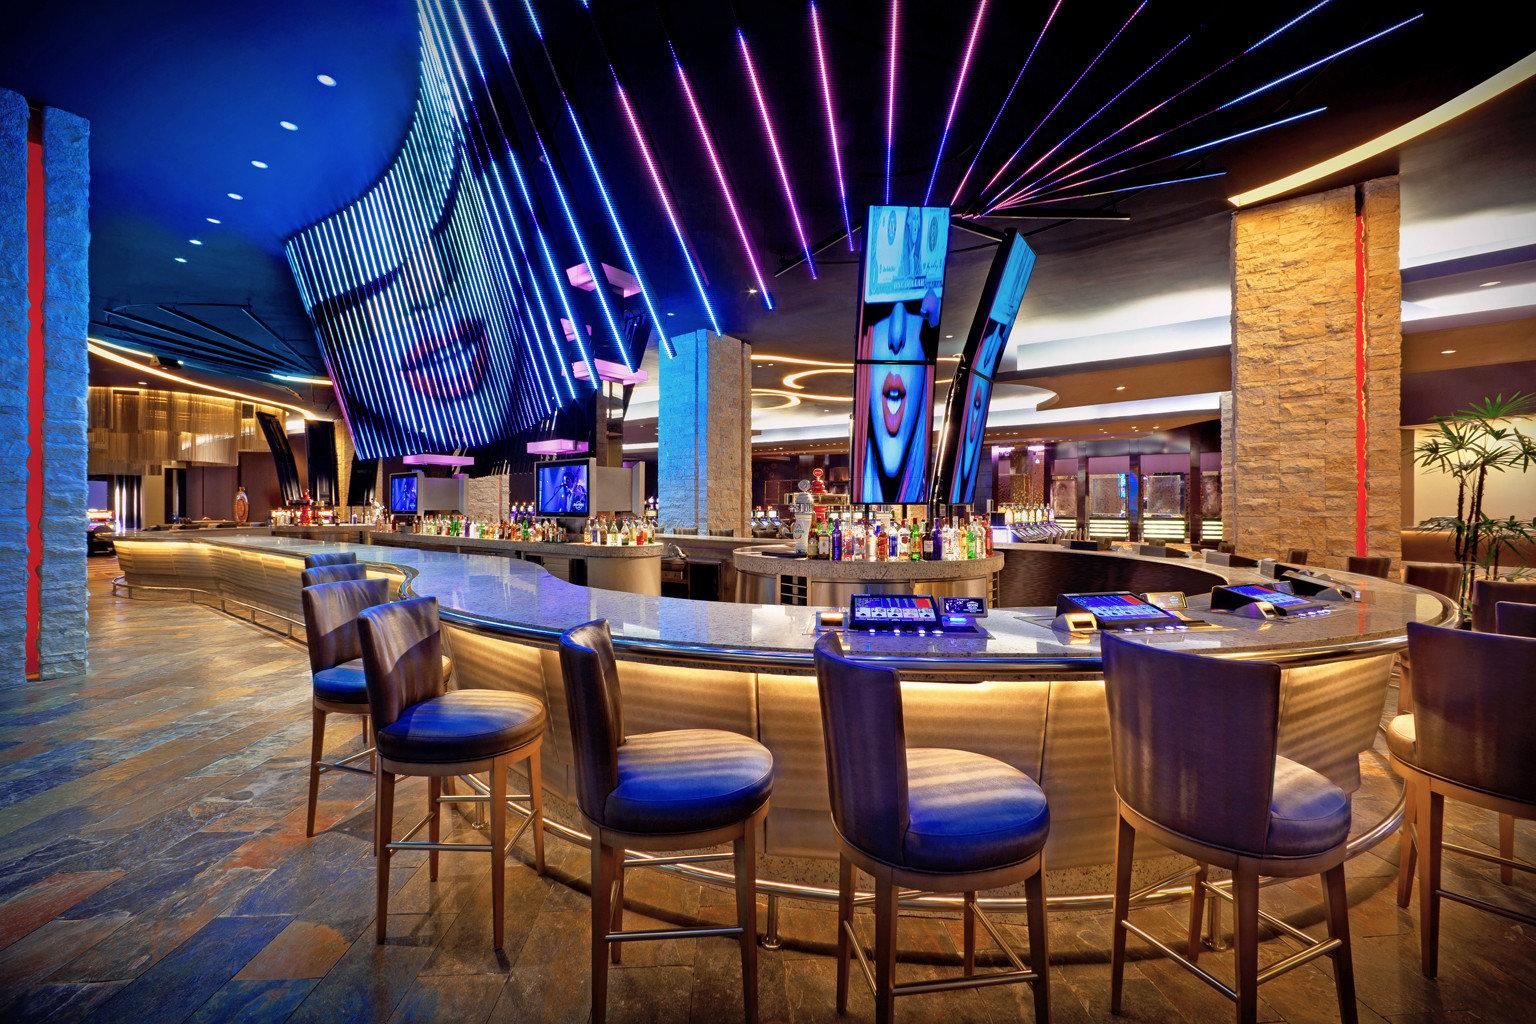 All-Inclusive Resorts Bar Dining Drink Eat Elegant Hip Hotels Modern Solo Travel chair function hall convention center blue nightclub ballroom restaurant Lobby